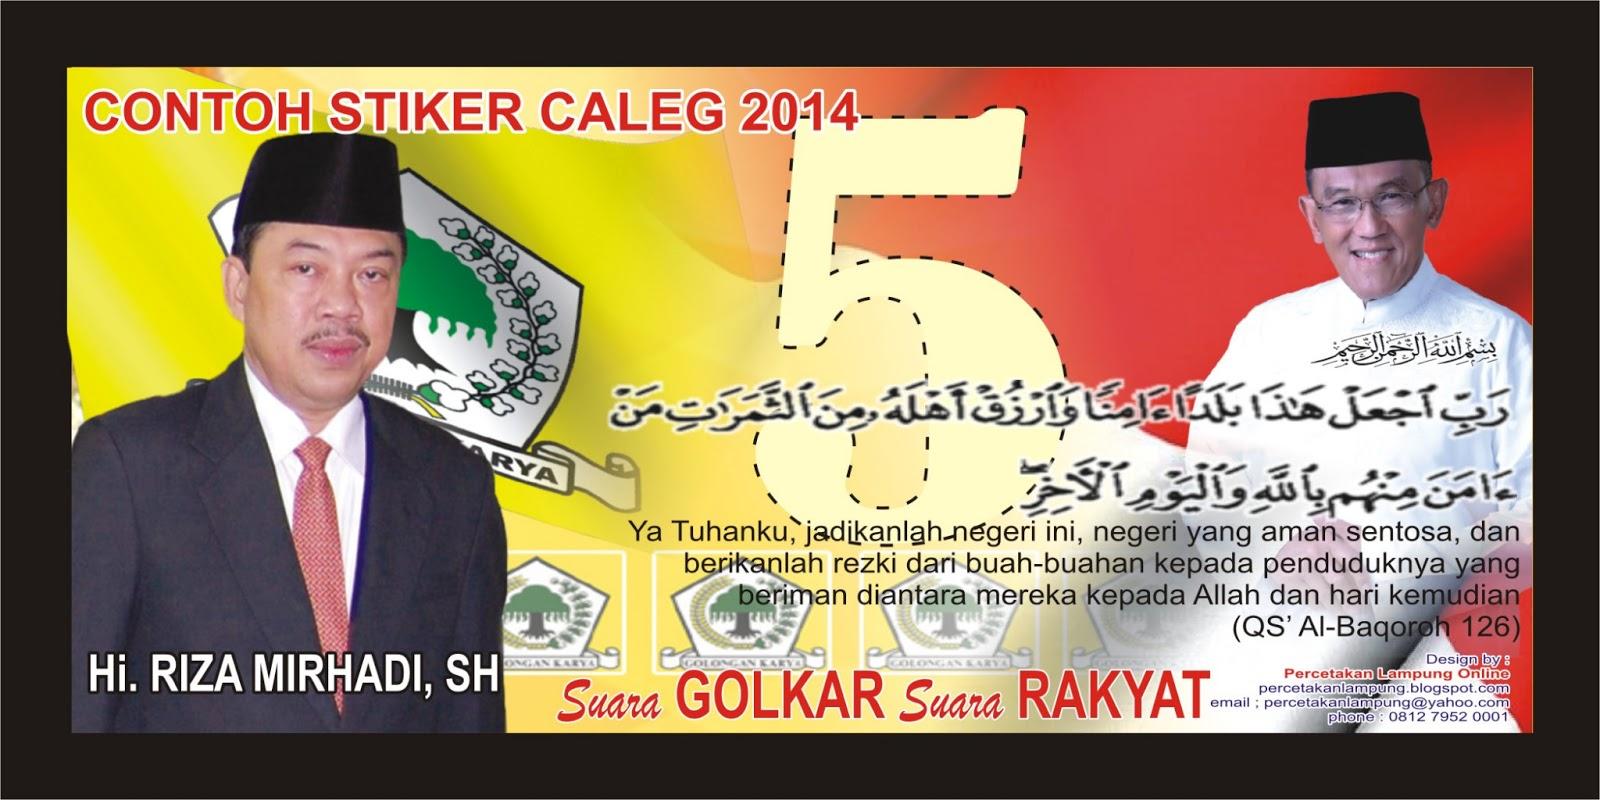 promosi caleg dengan menggunakan stiker